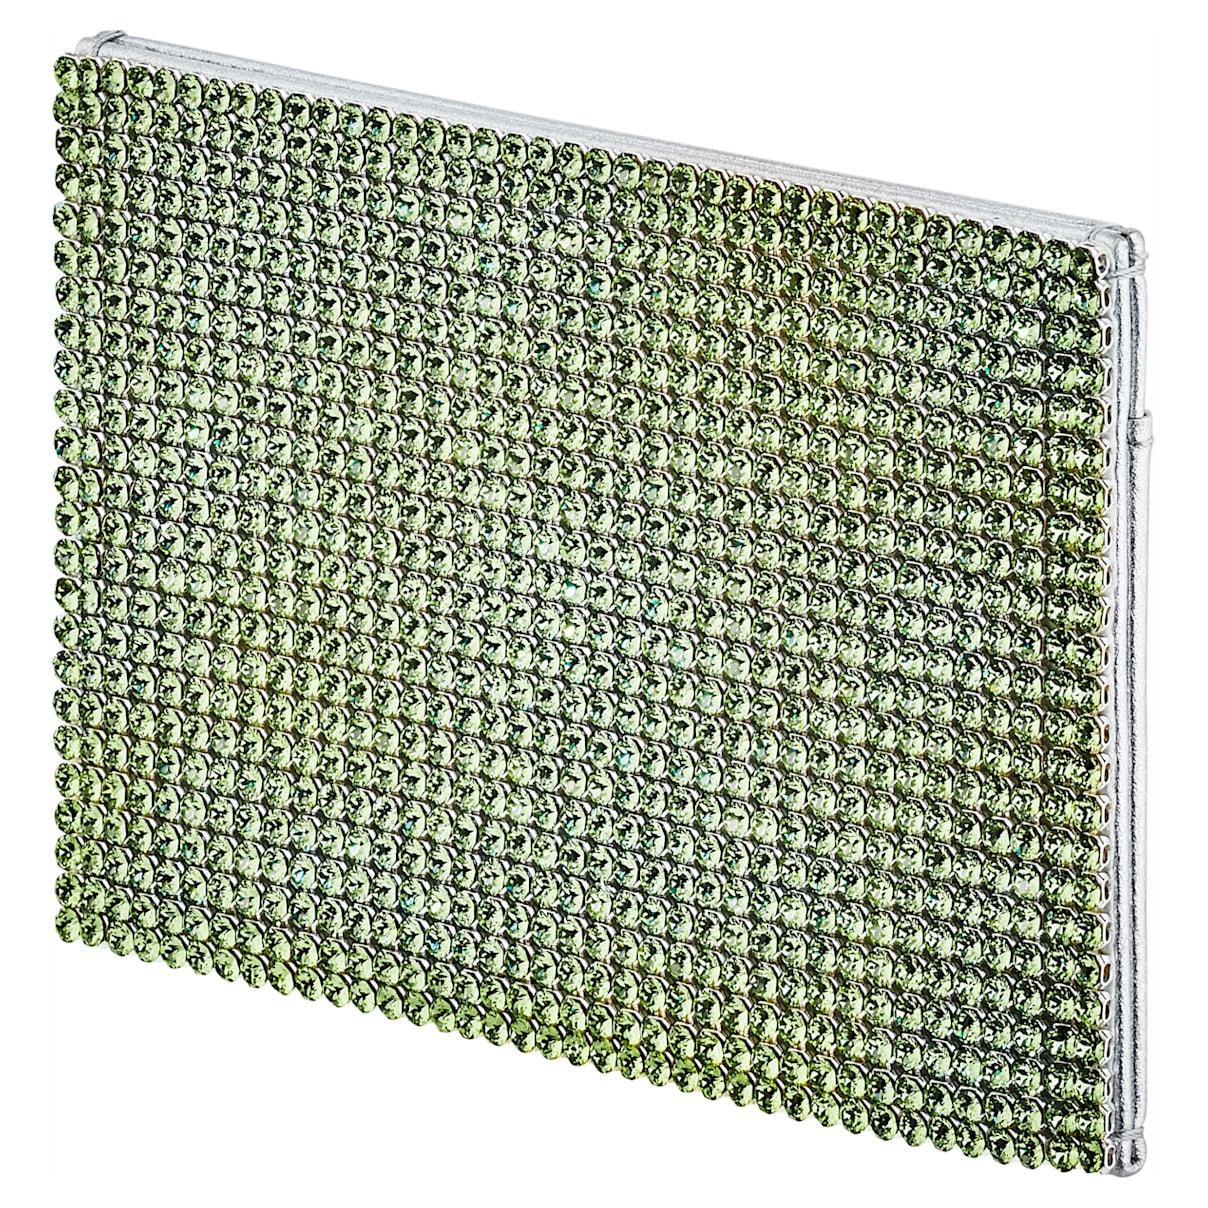 Portacarte Marina, verde, placcato palladio